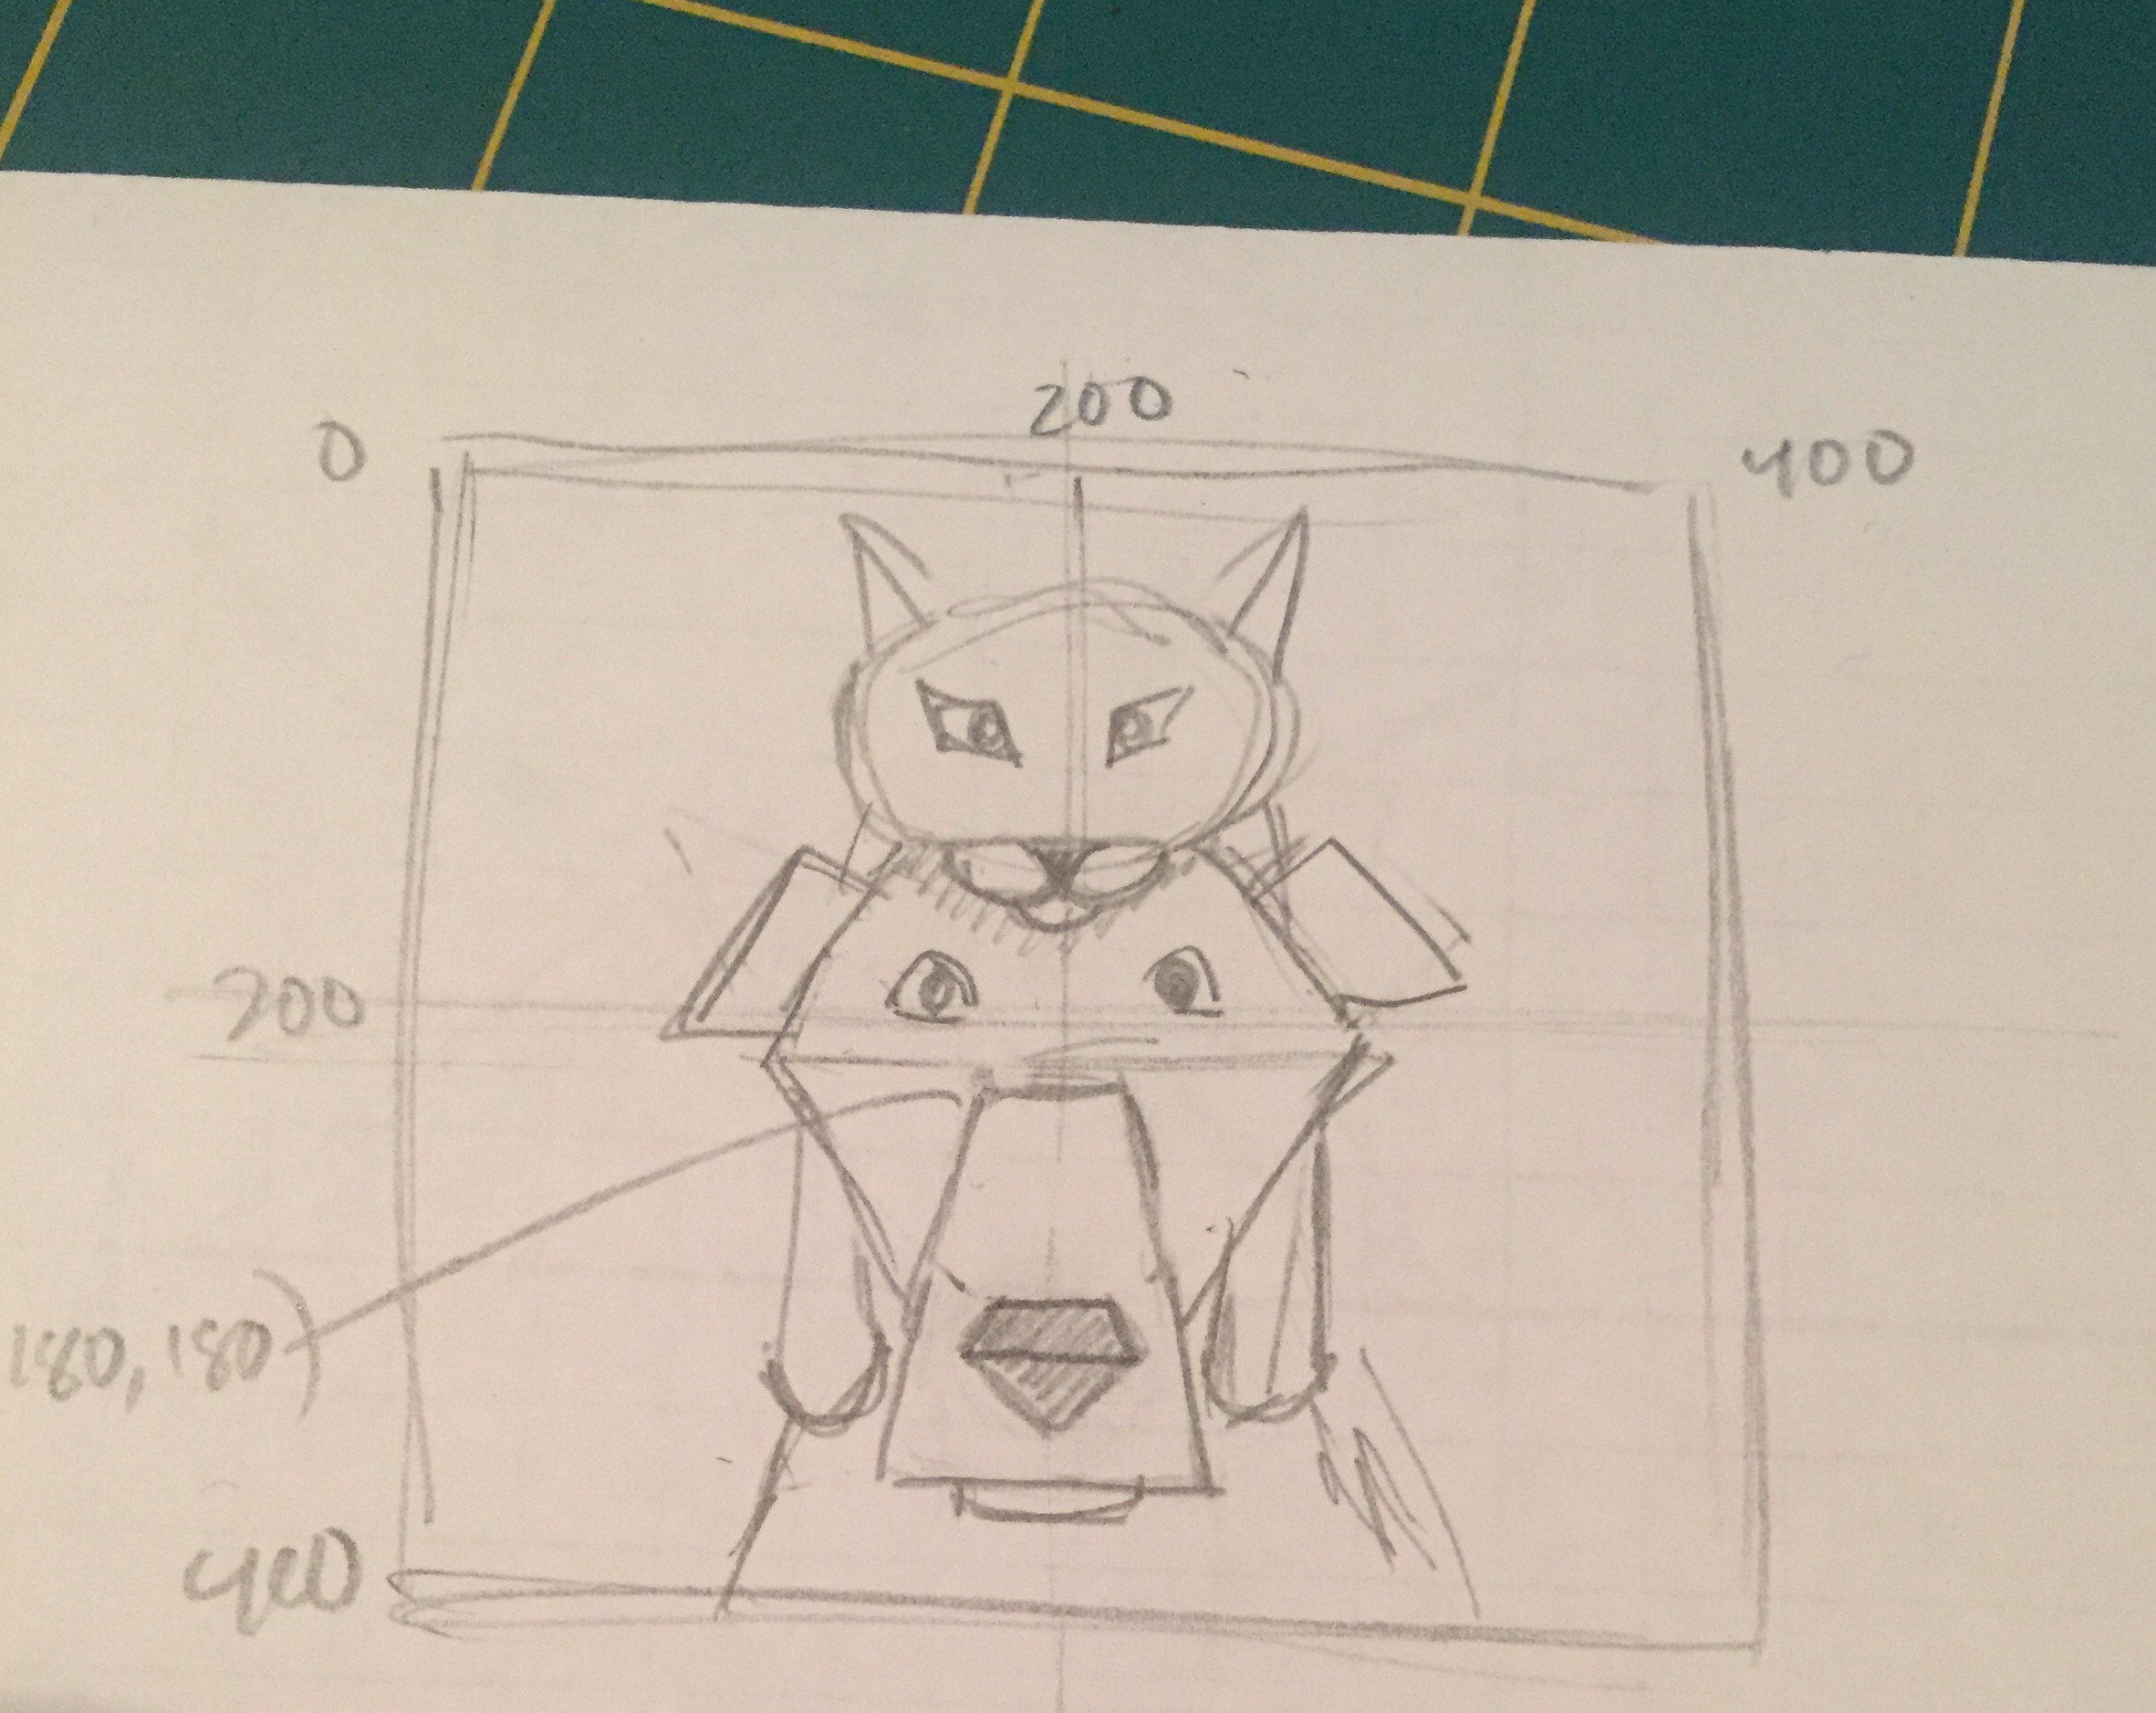 ICM_HW_Sketch.jpg